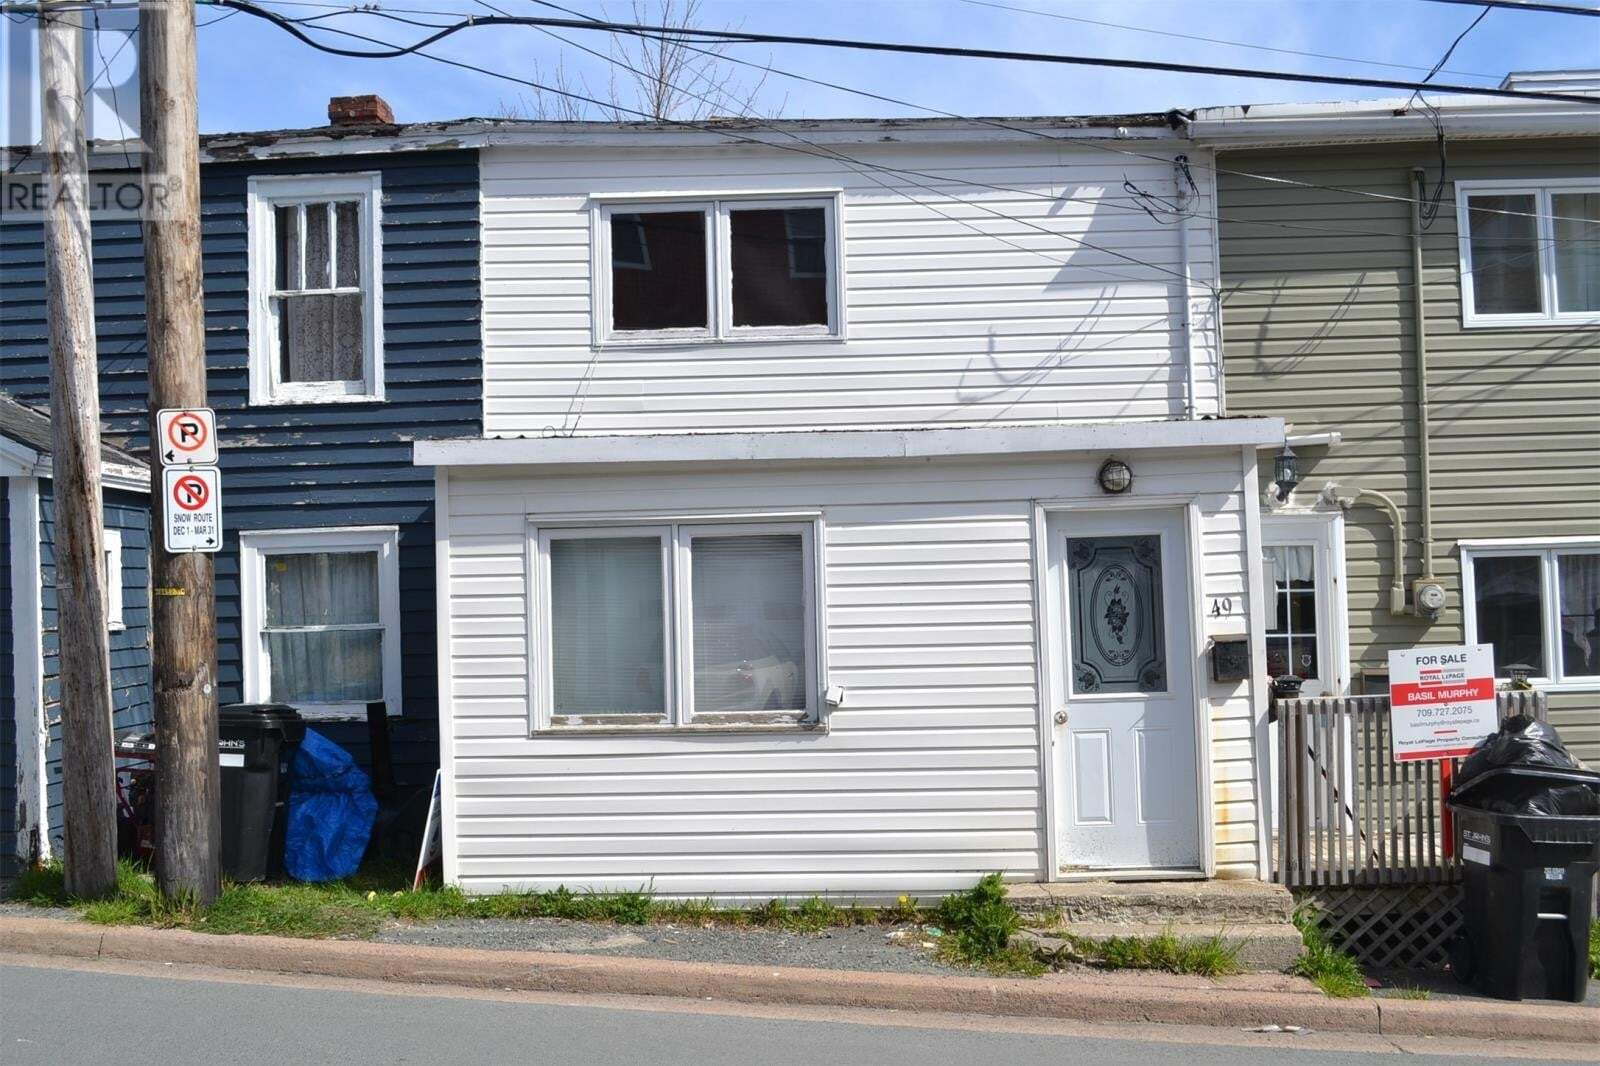 House for sale at 49 Quidi Vidi Village Rd St. John's Newfoundland - MLS: 1214144